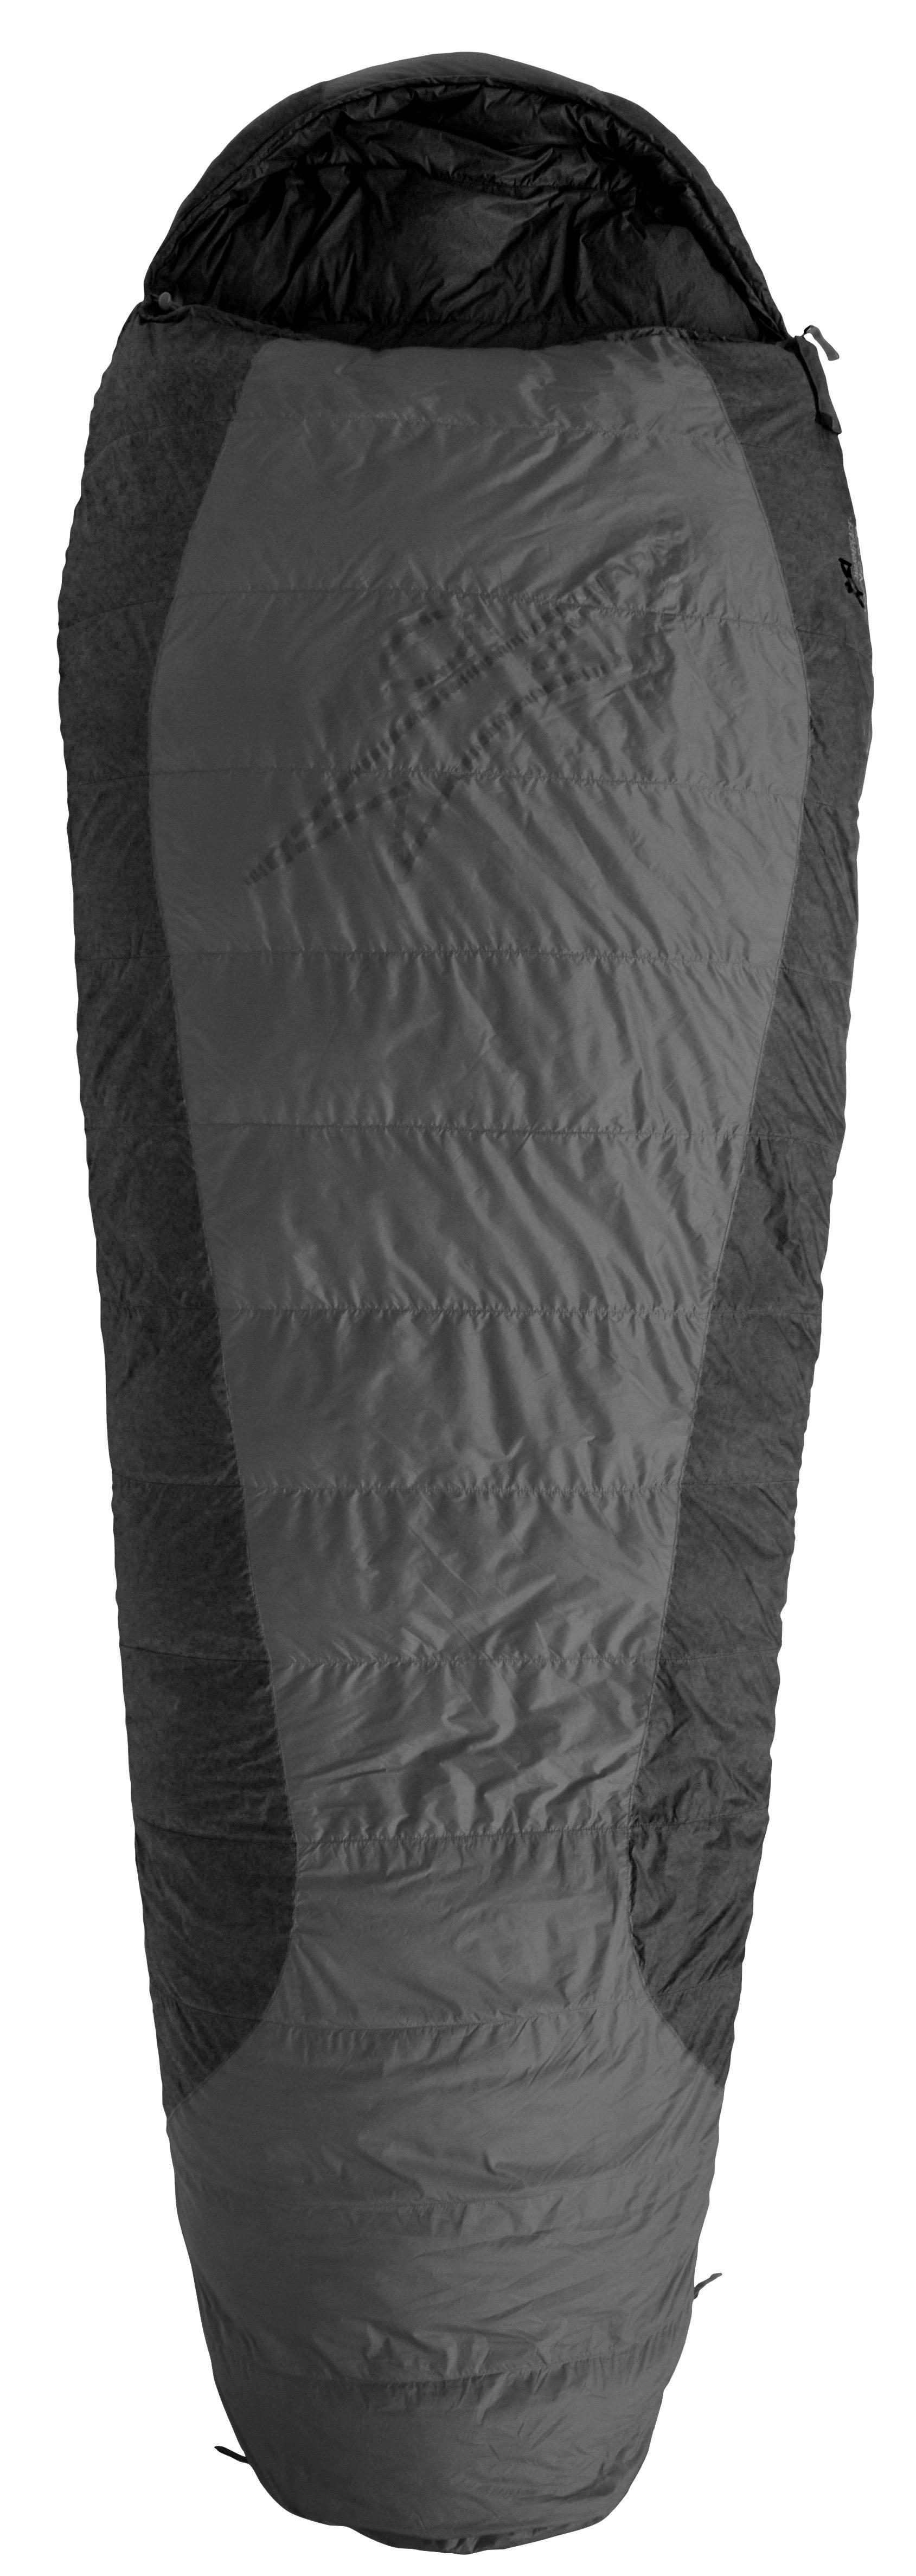 Sac de dormit puf Warmpeace Viking 900 - Gri